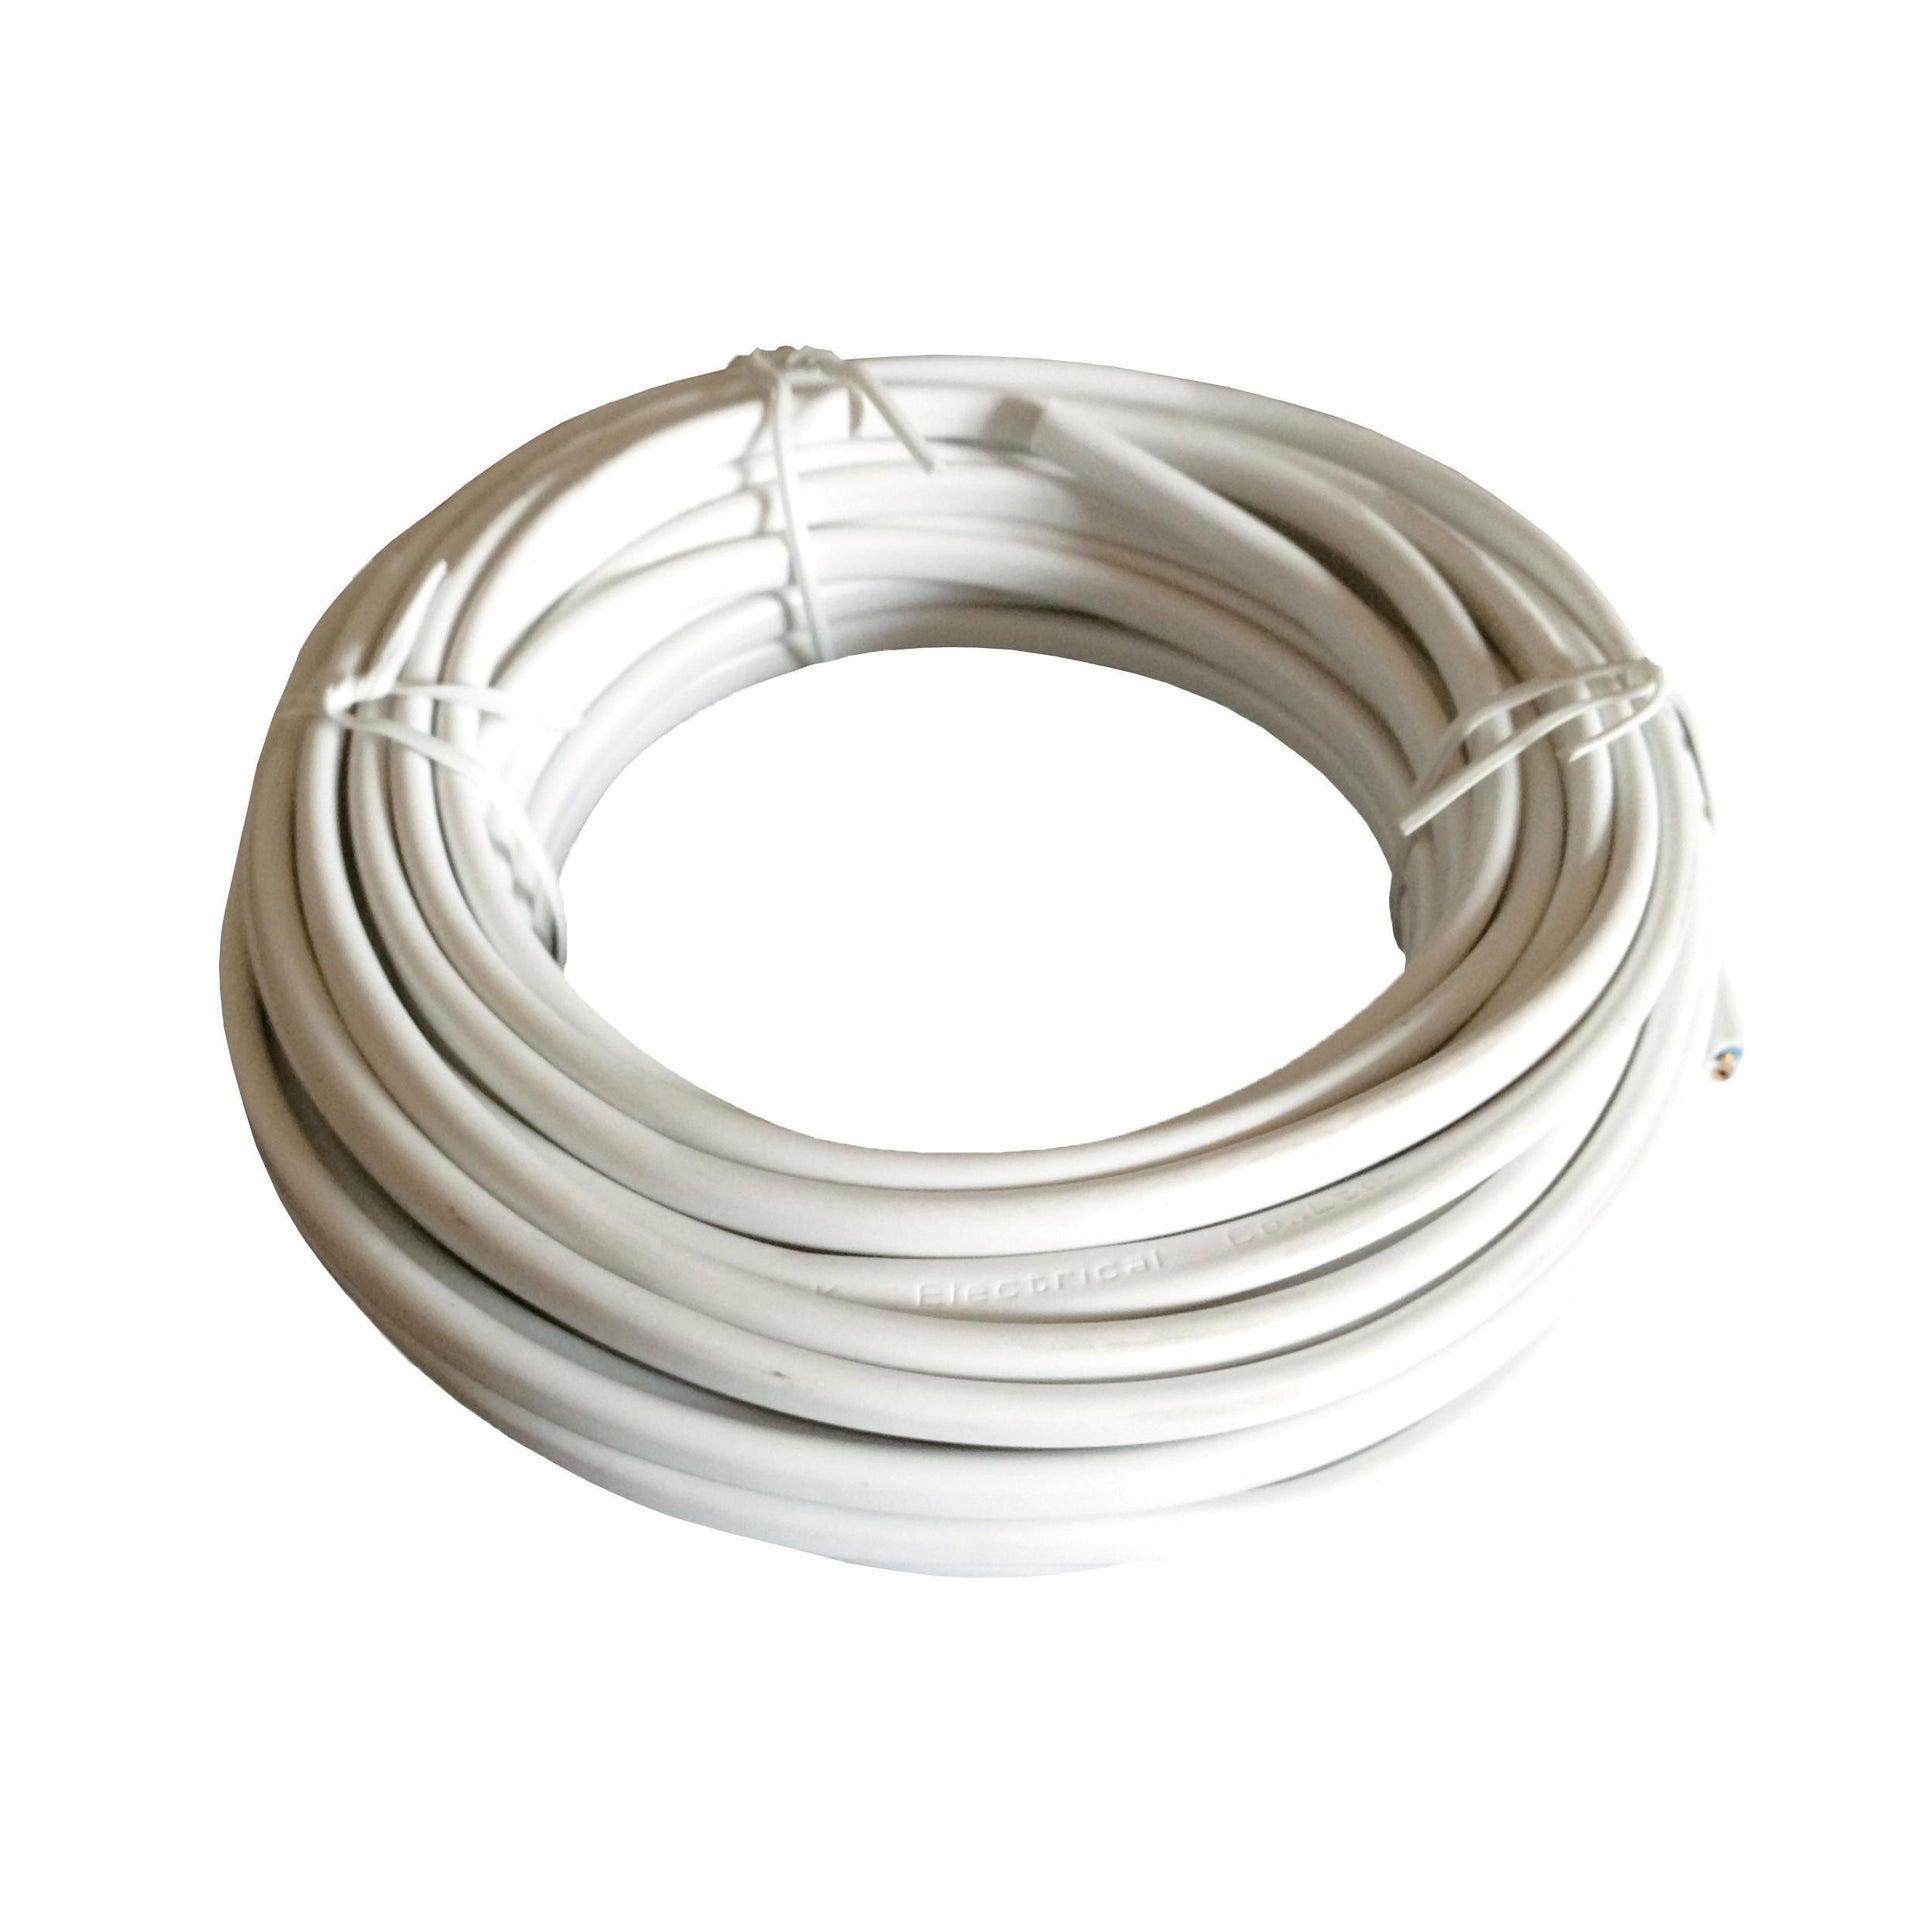 Cavo elettrico bianco H03VVH2-F 2 fili x 0,75 mm² 5 m LEXMAN Matassa - 1